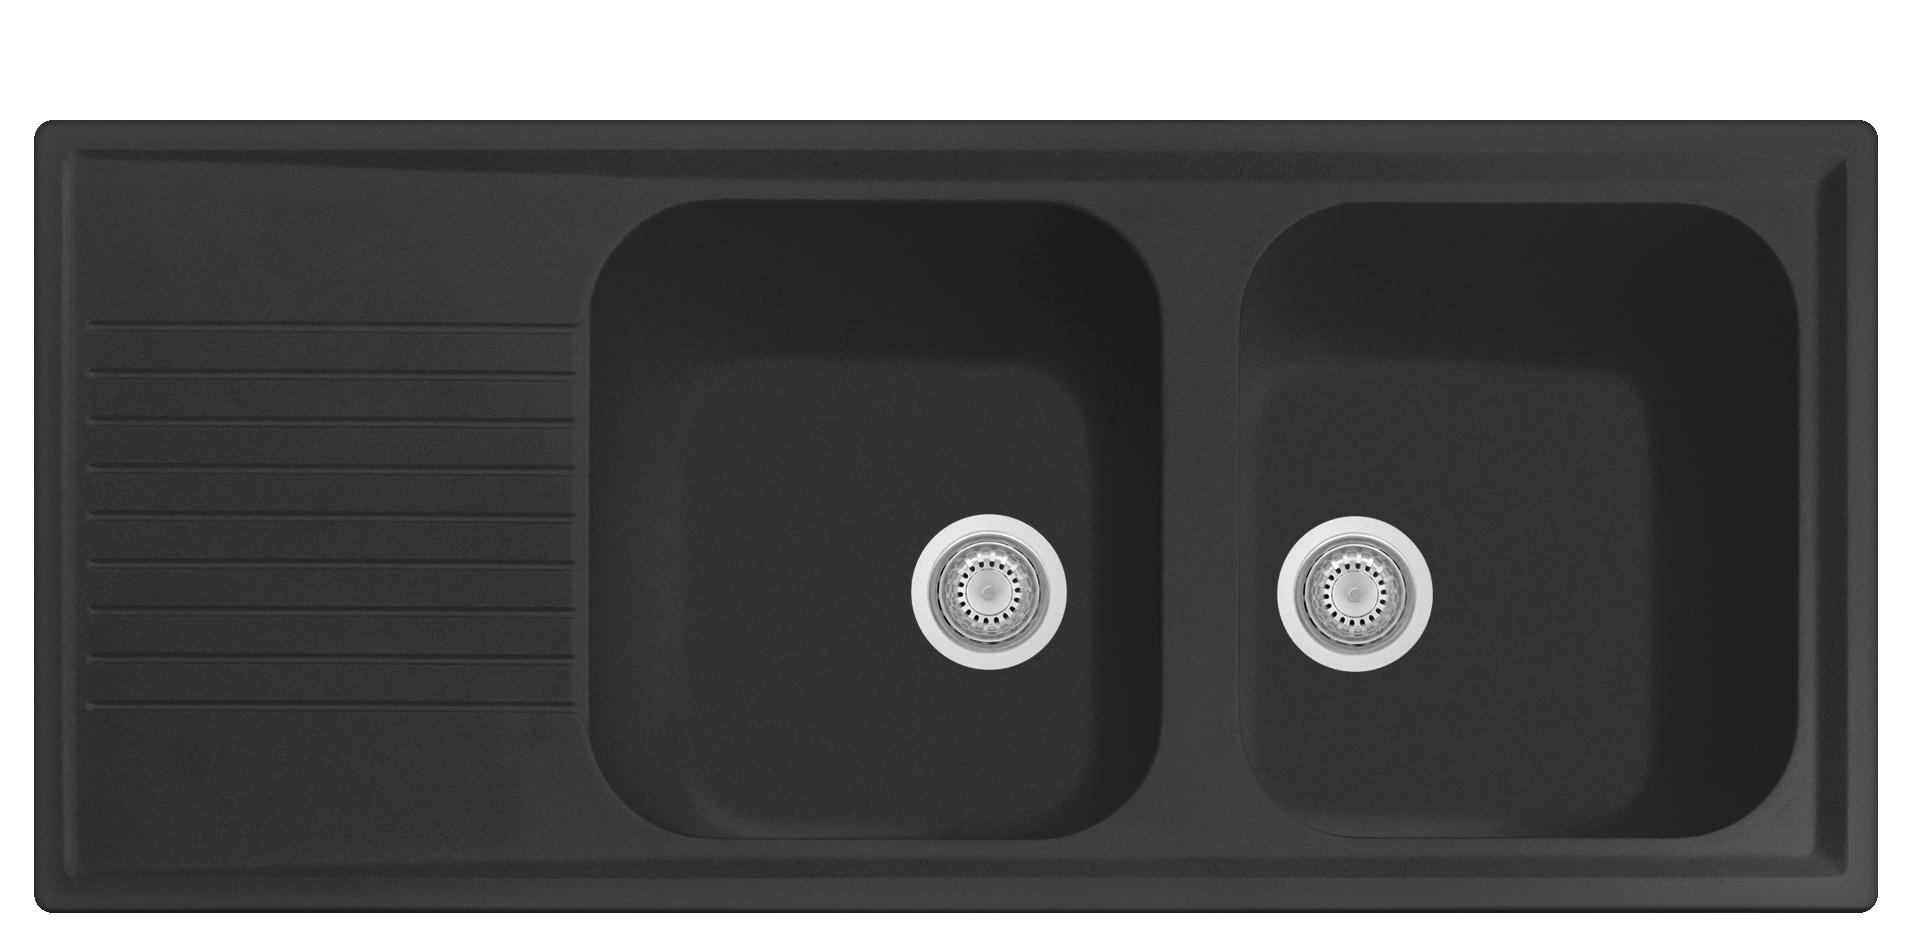 Plus 2 Bowl Sink Black Matte w Draining Board PL1162 for Kitchen